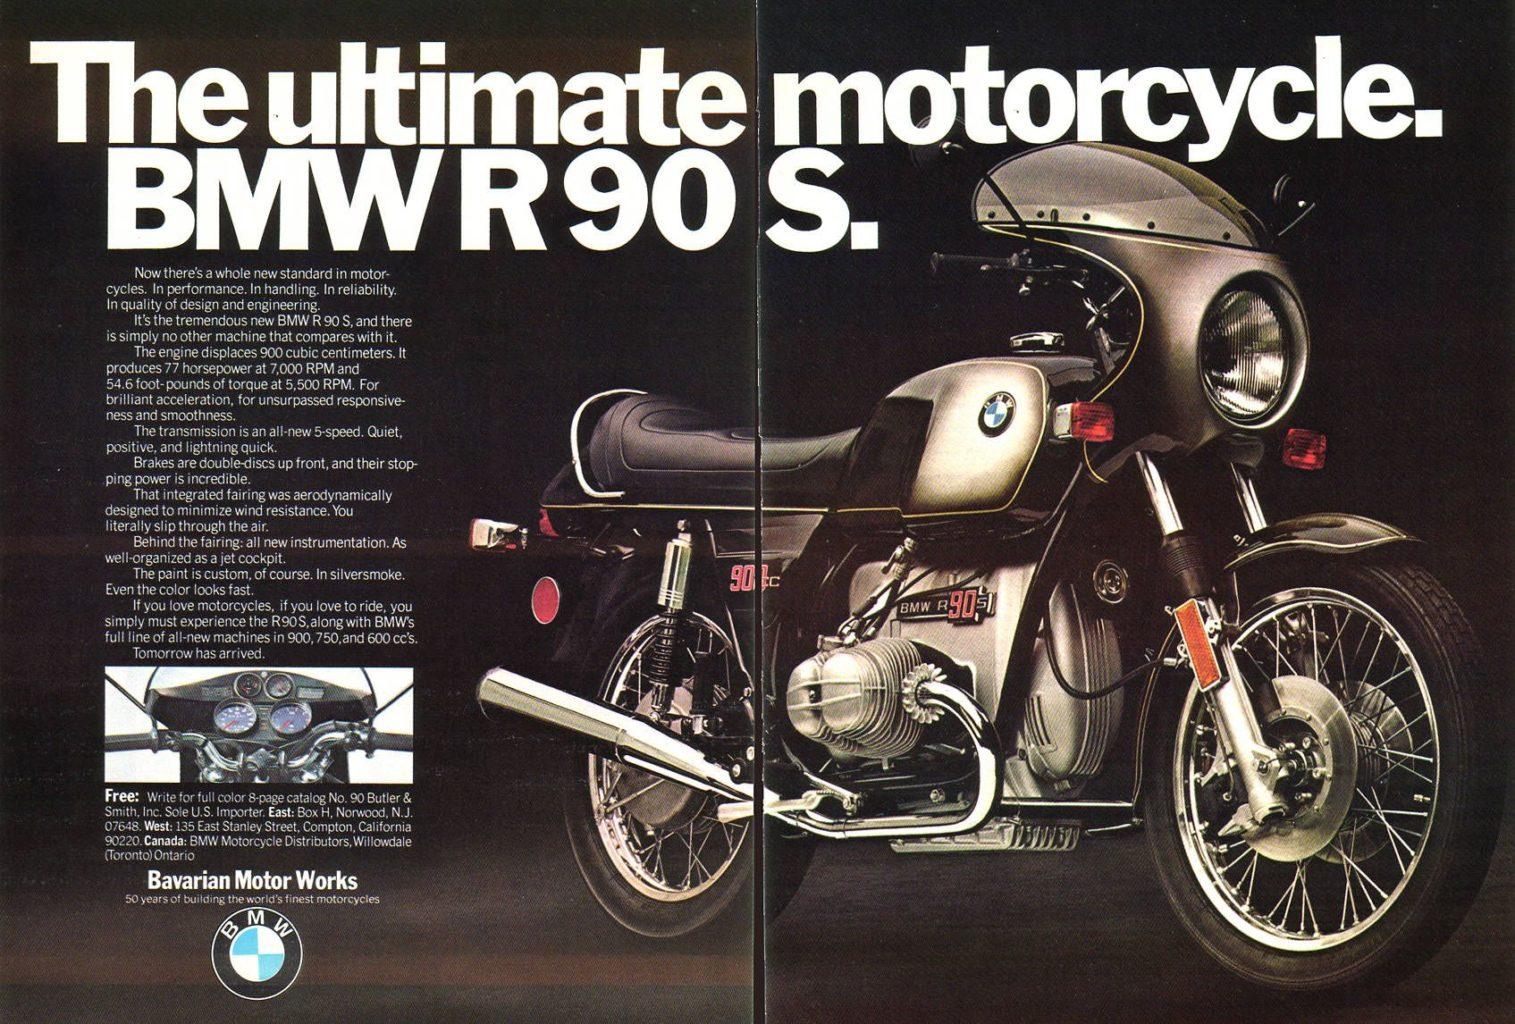 BMW R90S history